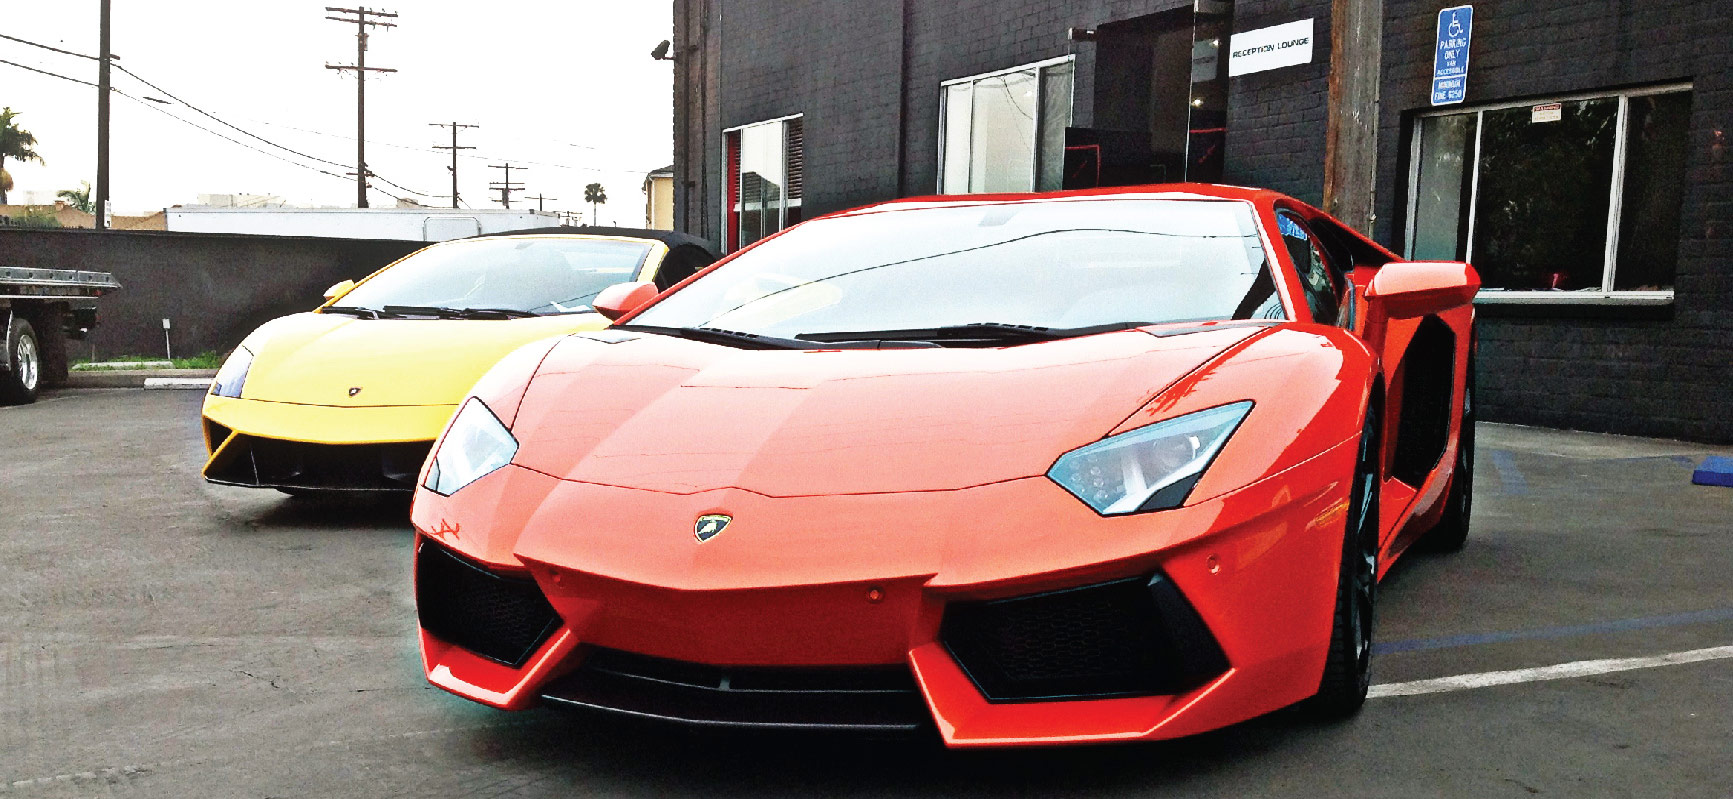 Car_wrap58.jpg